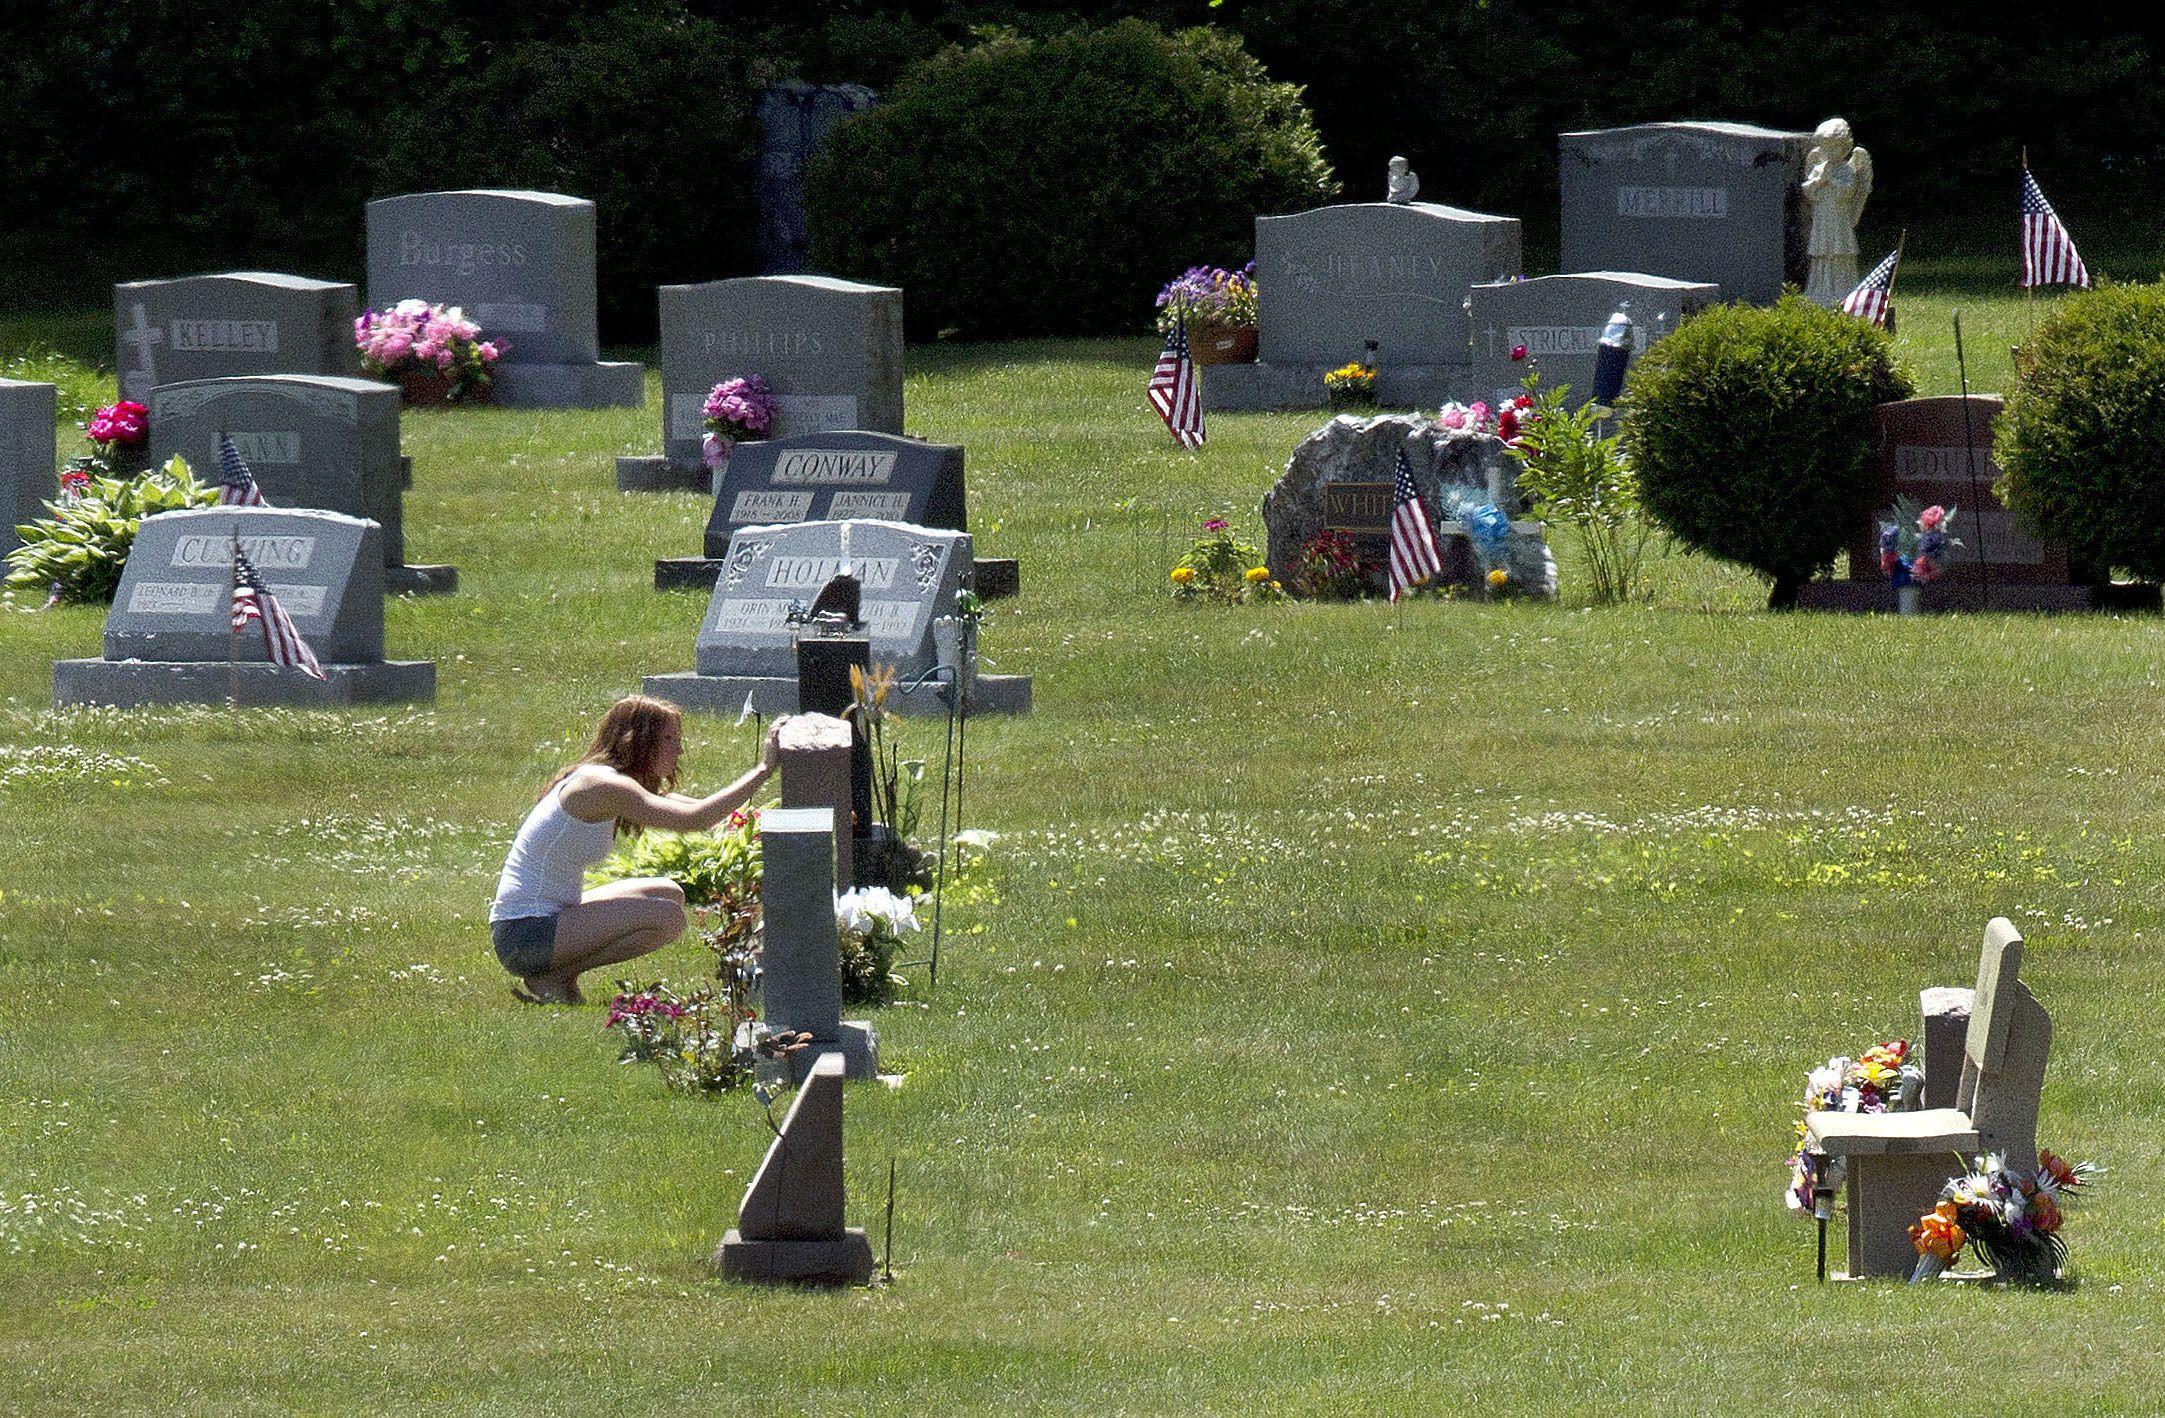 EEUU rebasa las 100.000 muertes por coronavirus